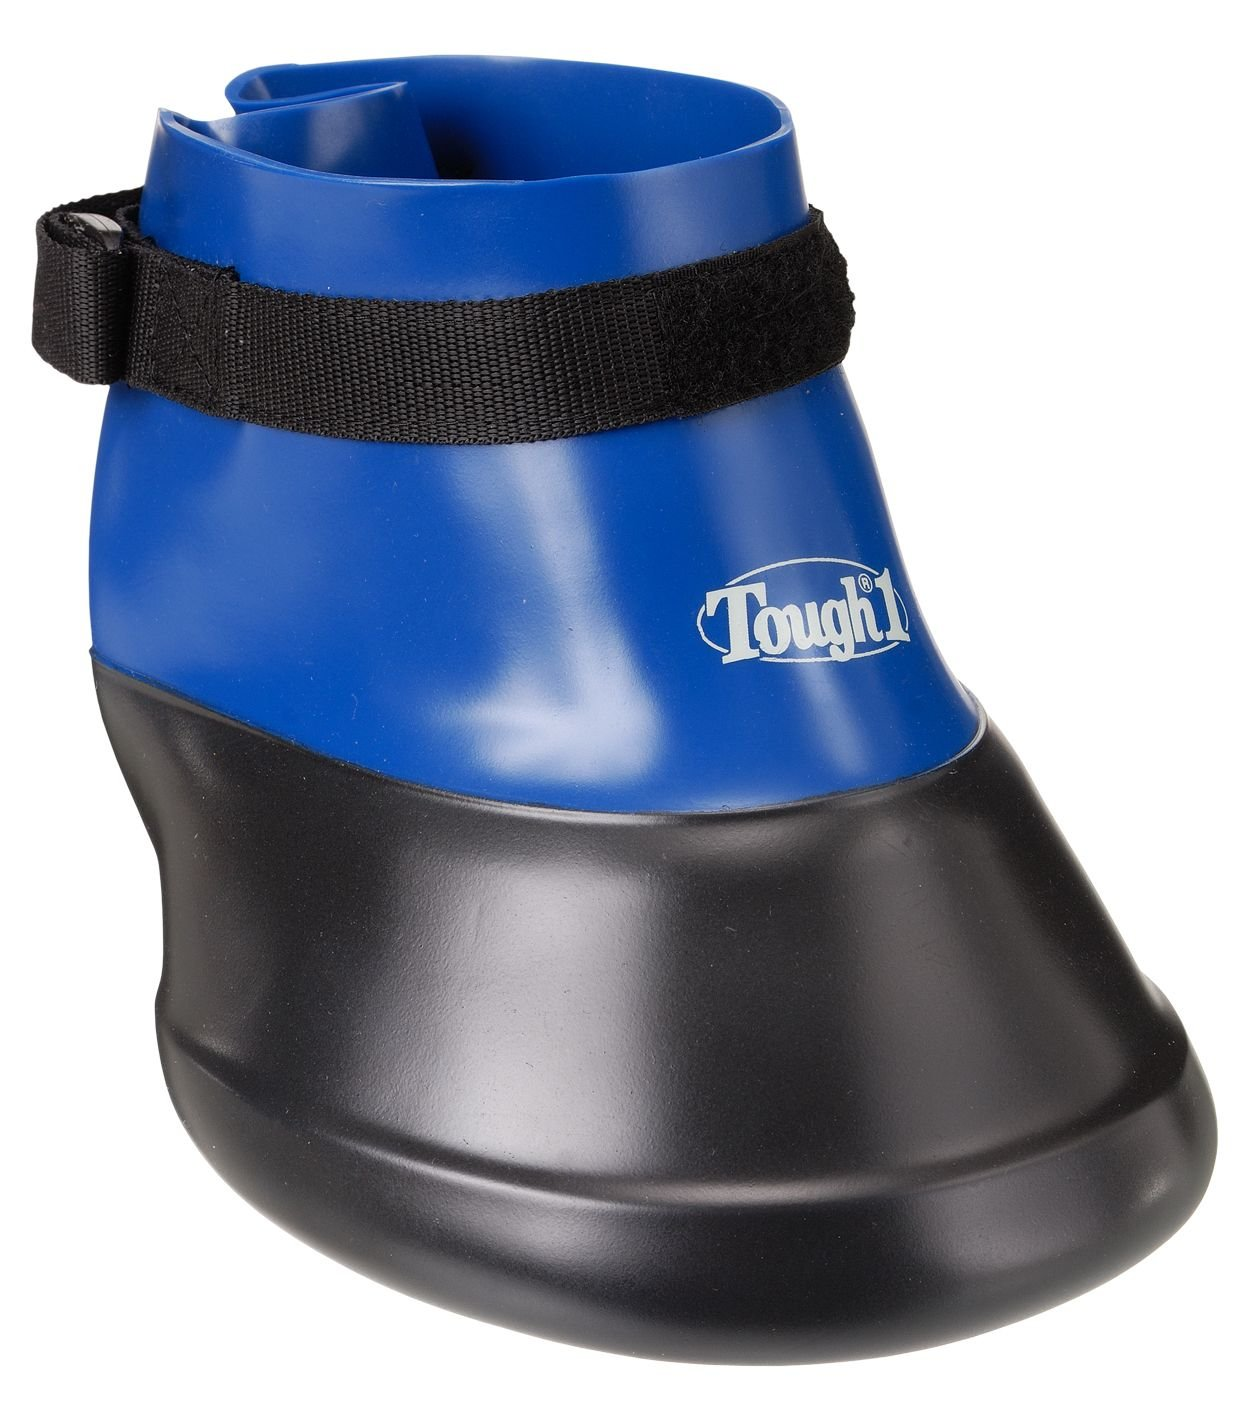 Tough 1 Hoof Saver Boot, Royal Blue, Medium by Tough 1